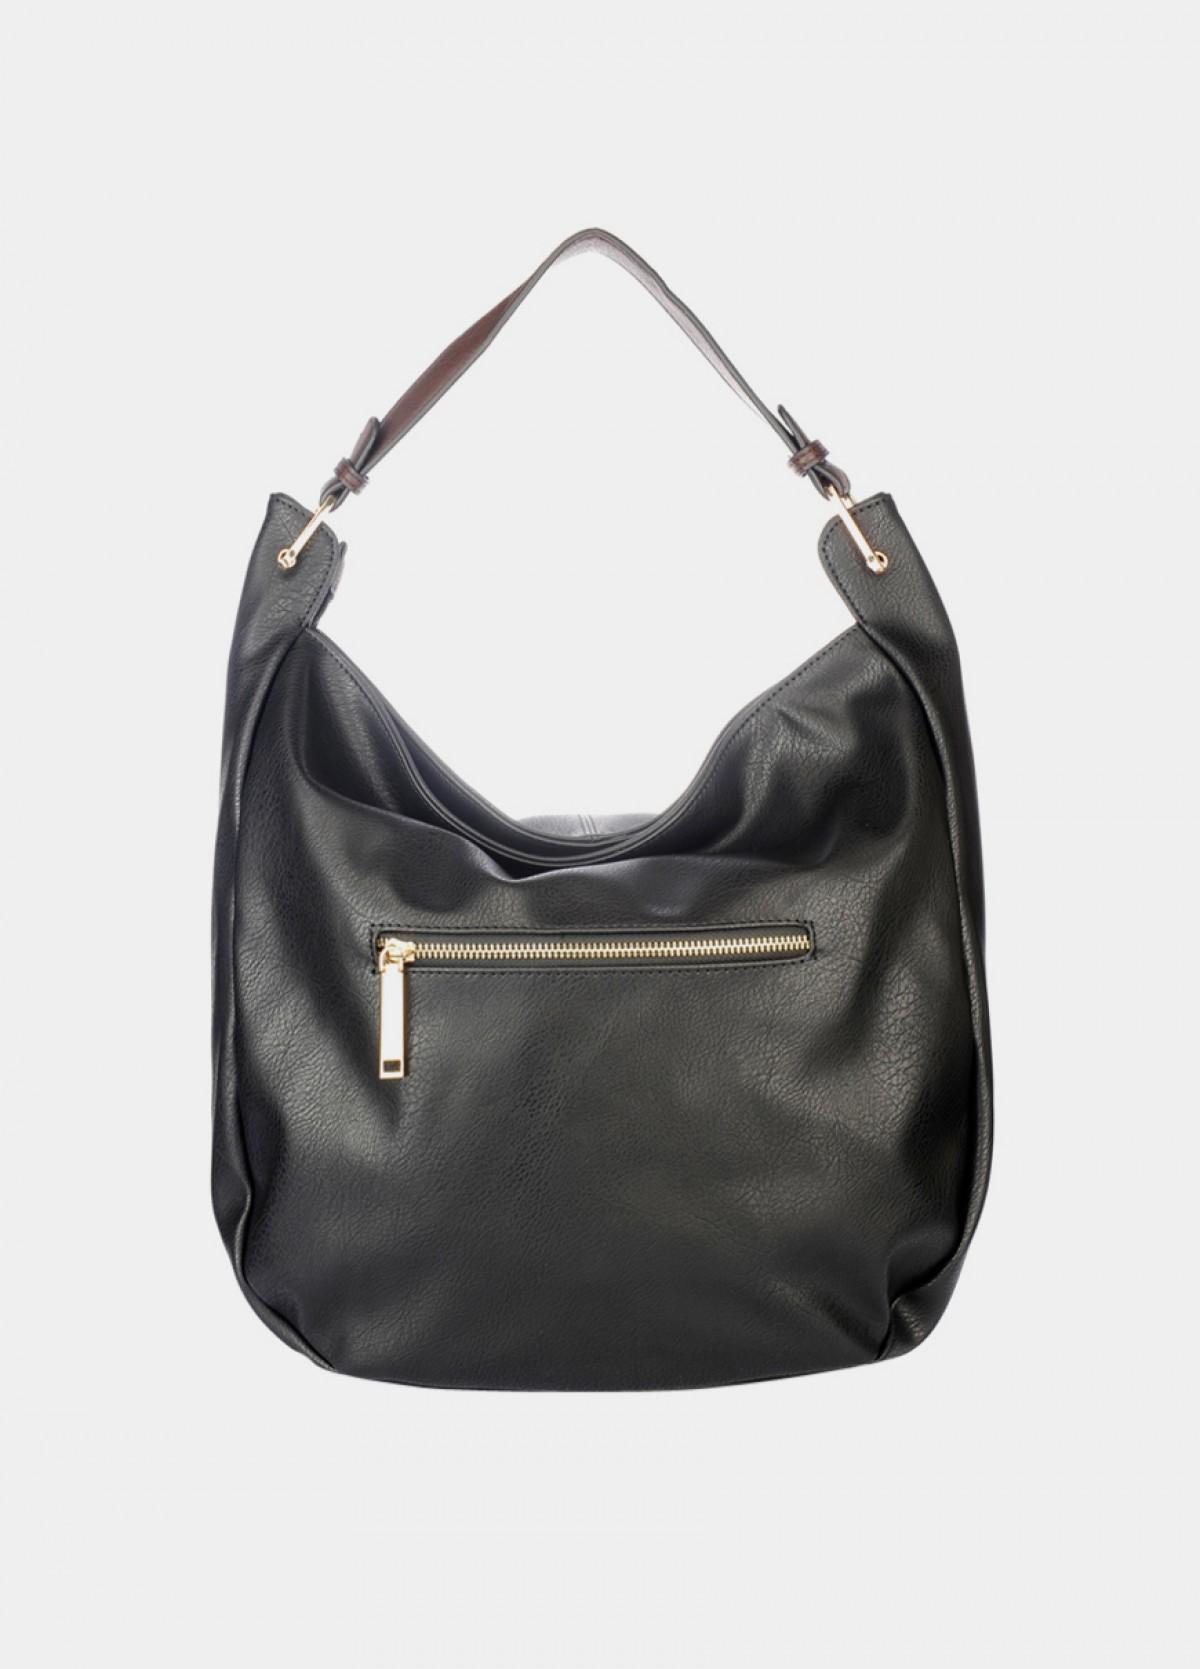 The Black Hobo Handbag